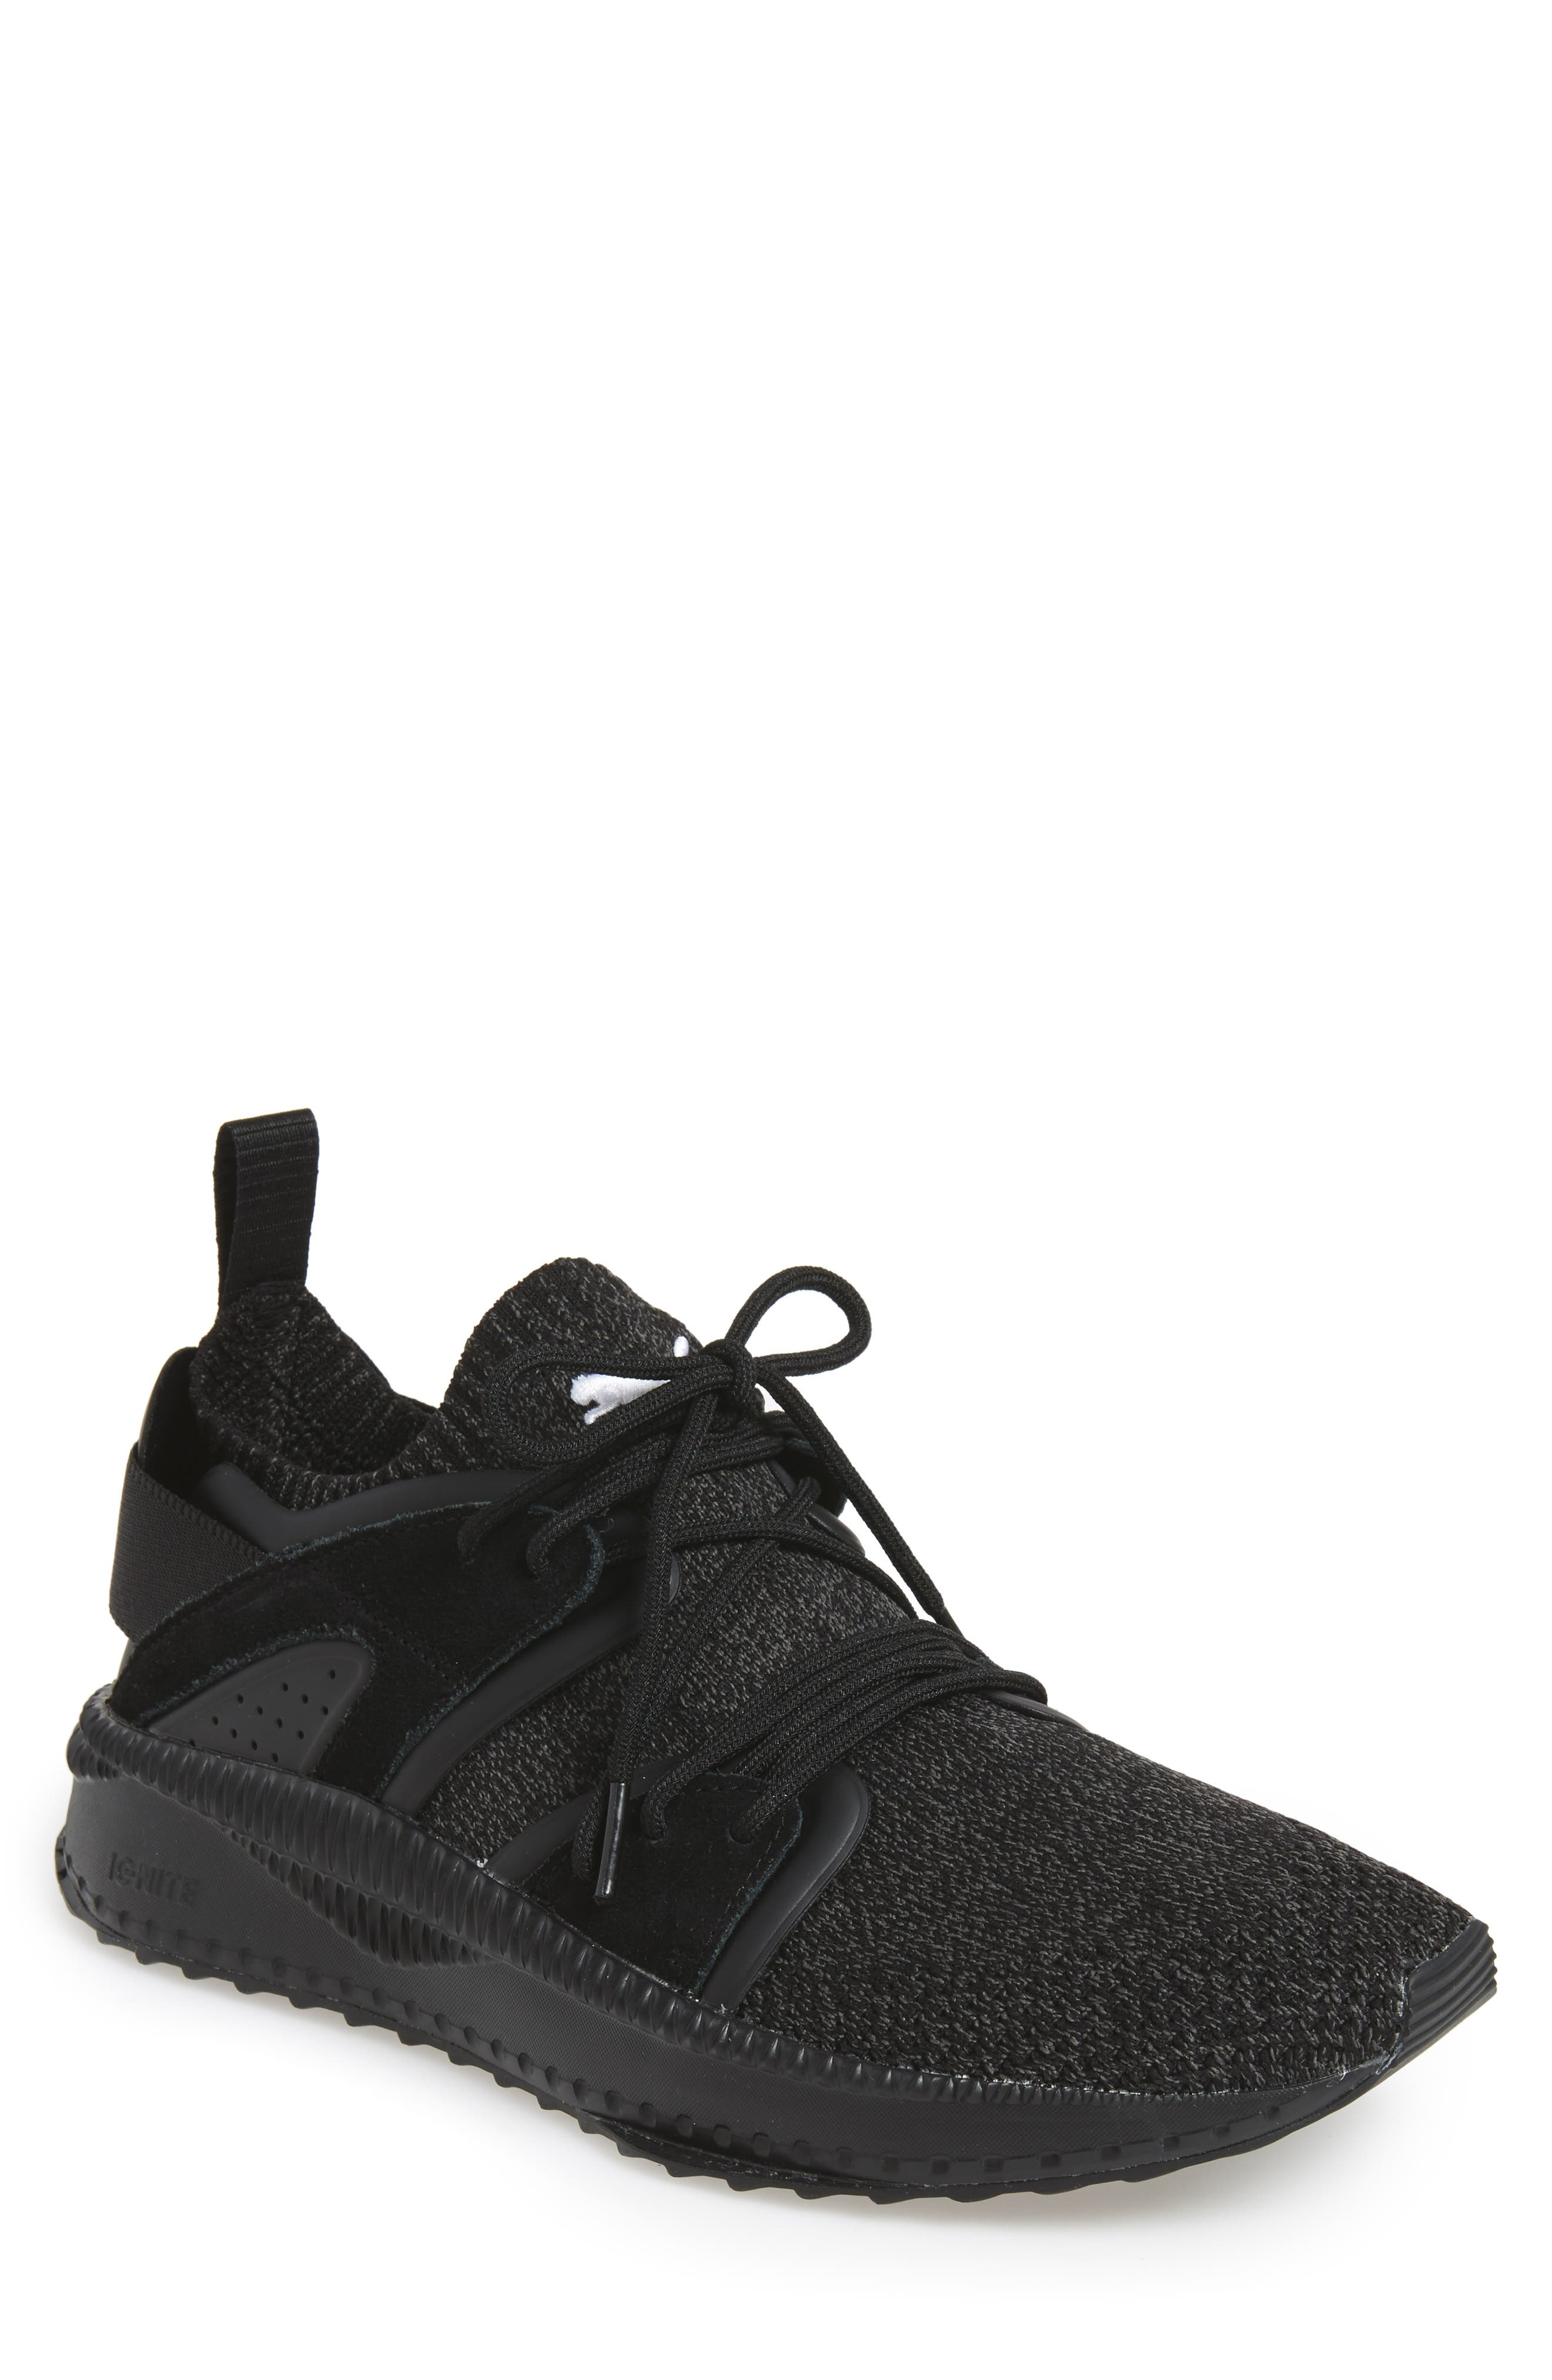 Tsugi Blaze EvoKnit Sneaker,                         Main,                         color,